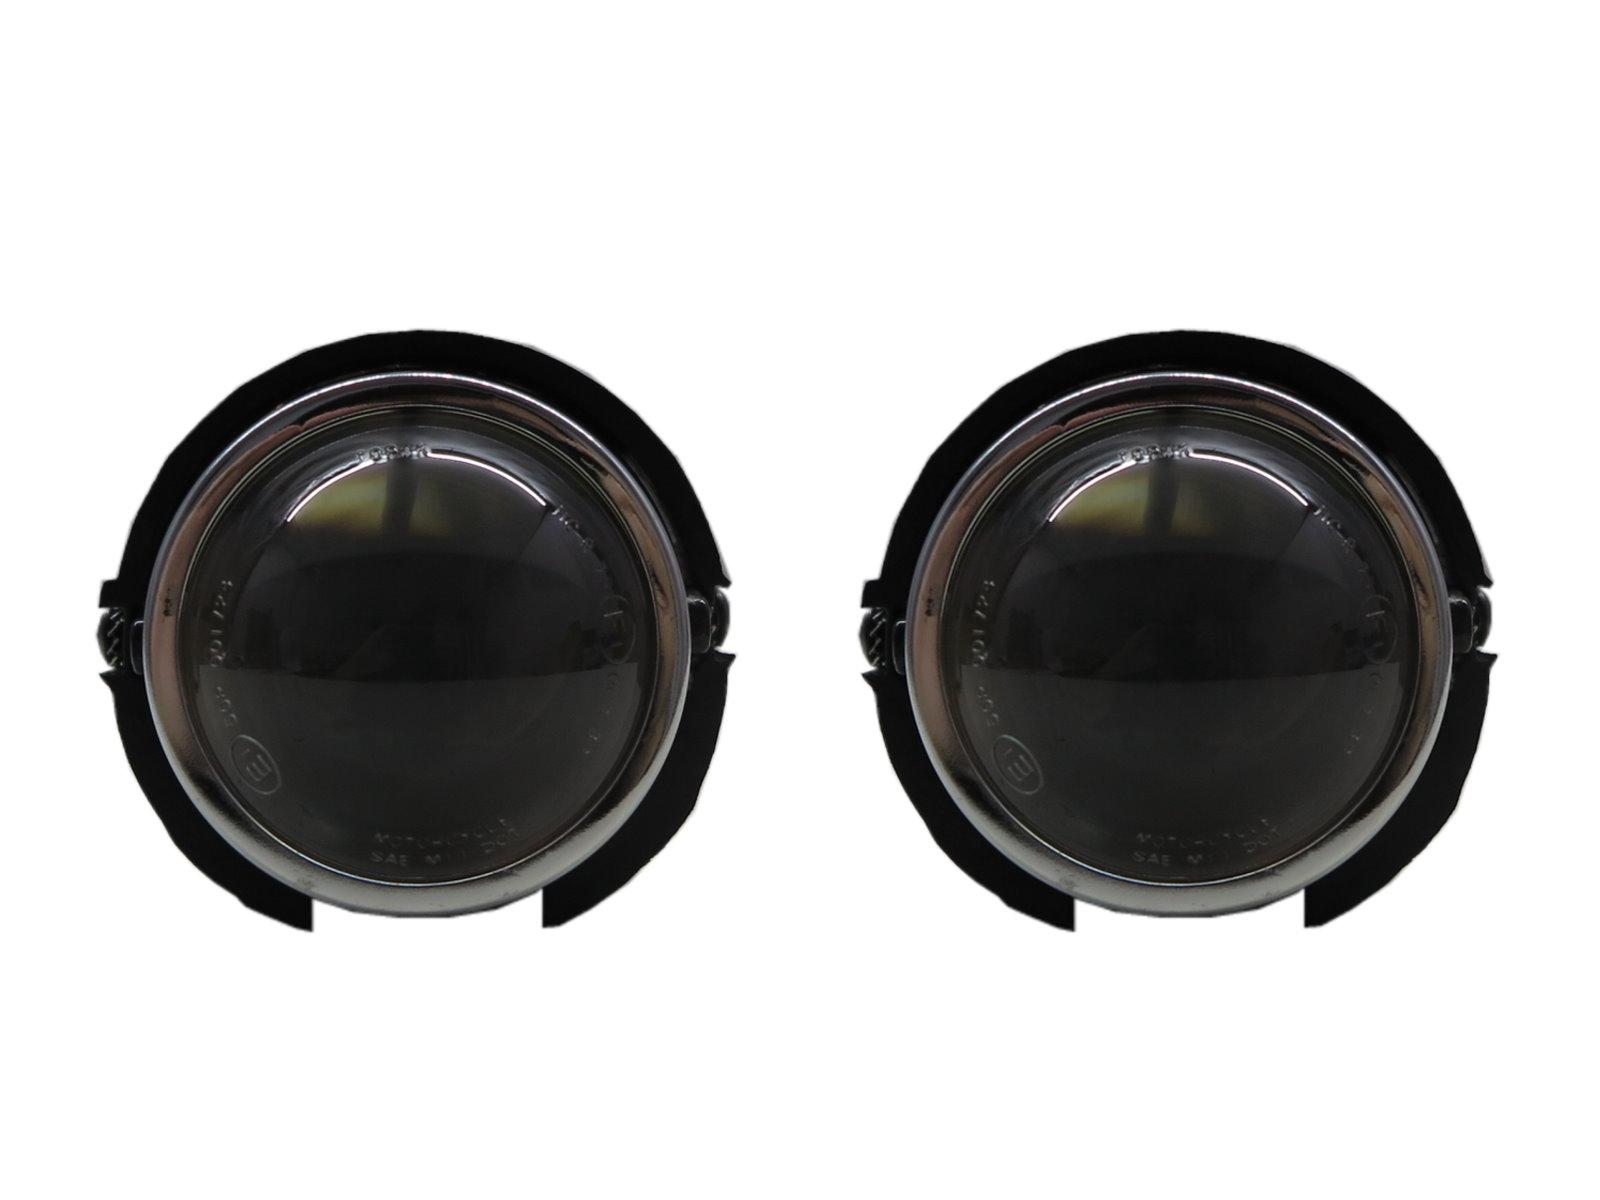 MURANO Z51 Second generation 08-14 SUV 5D Projector Fog Light Black for NISSAN